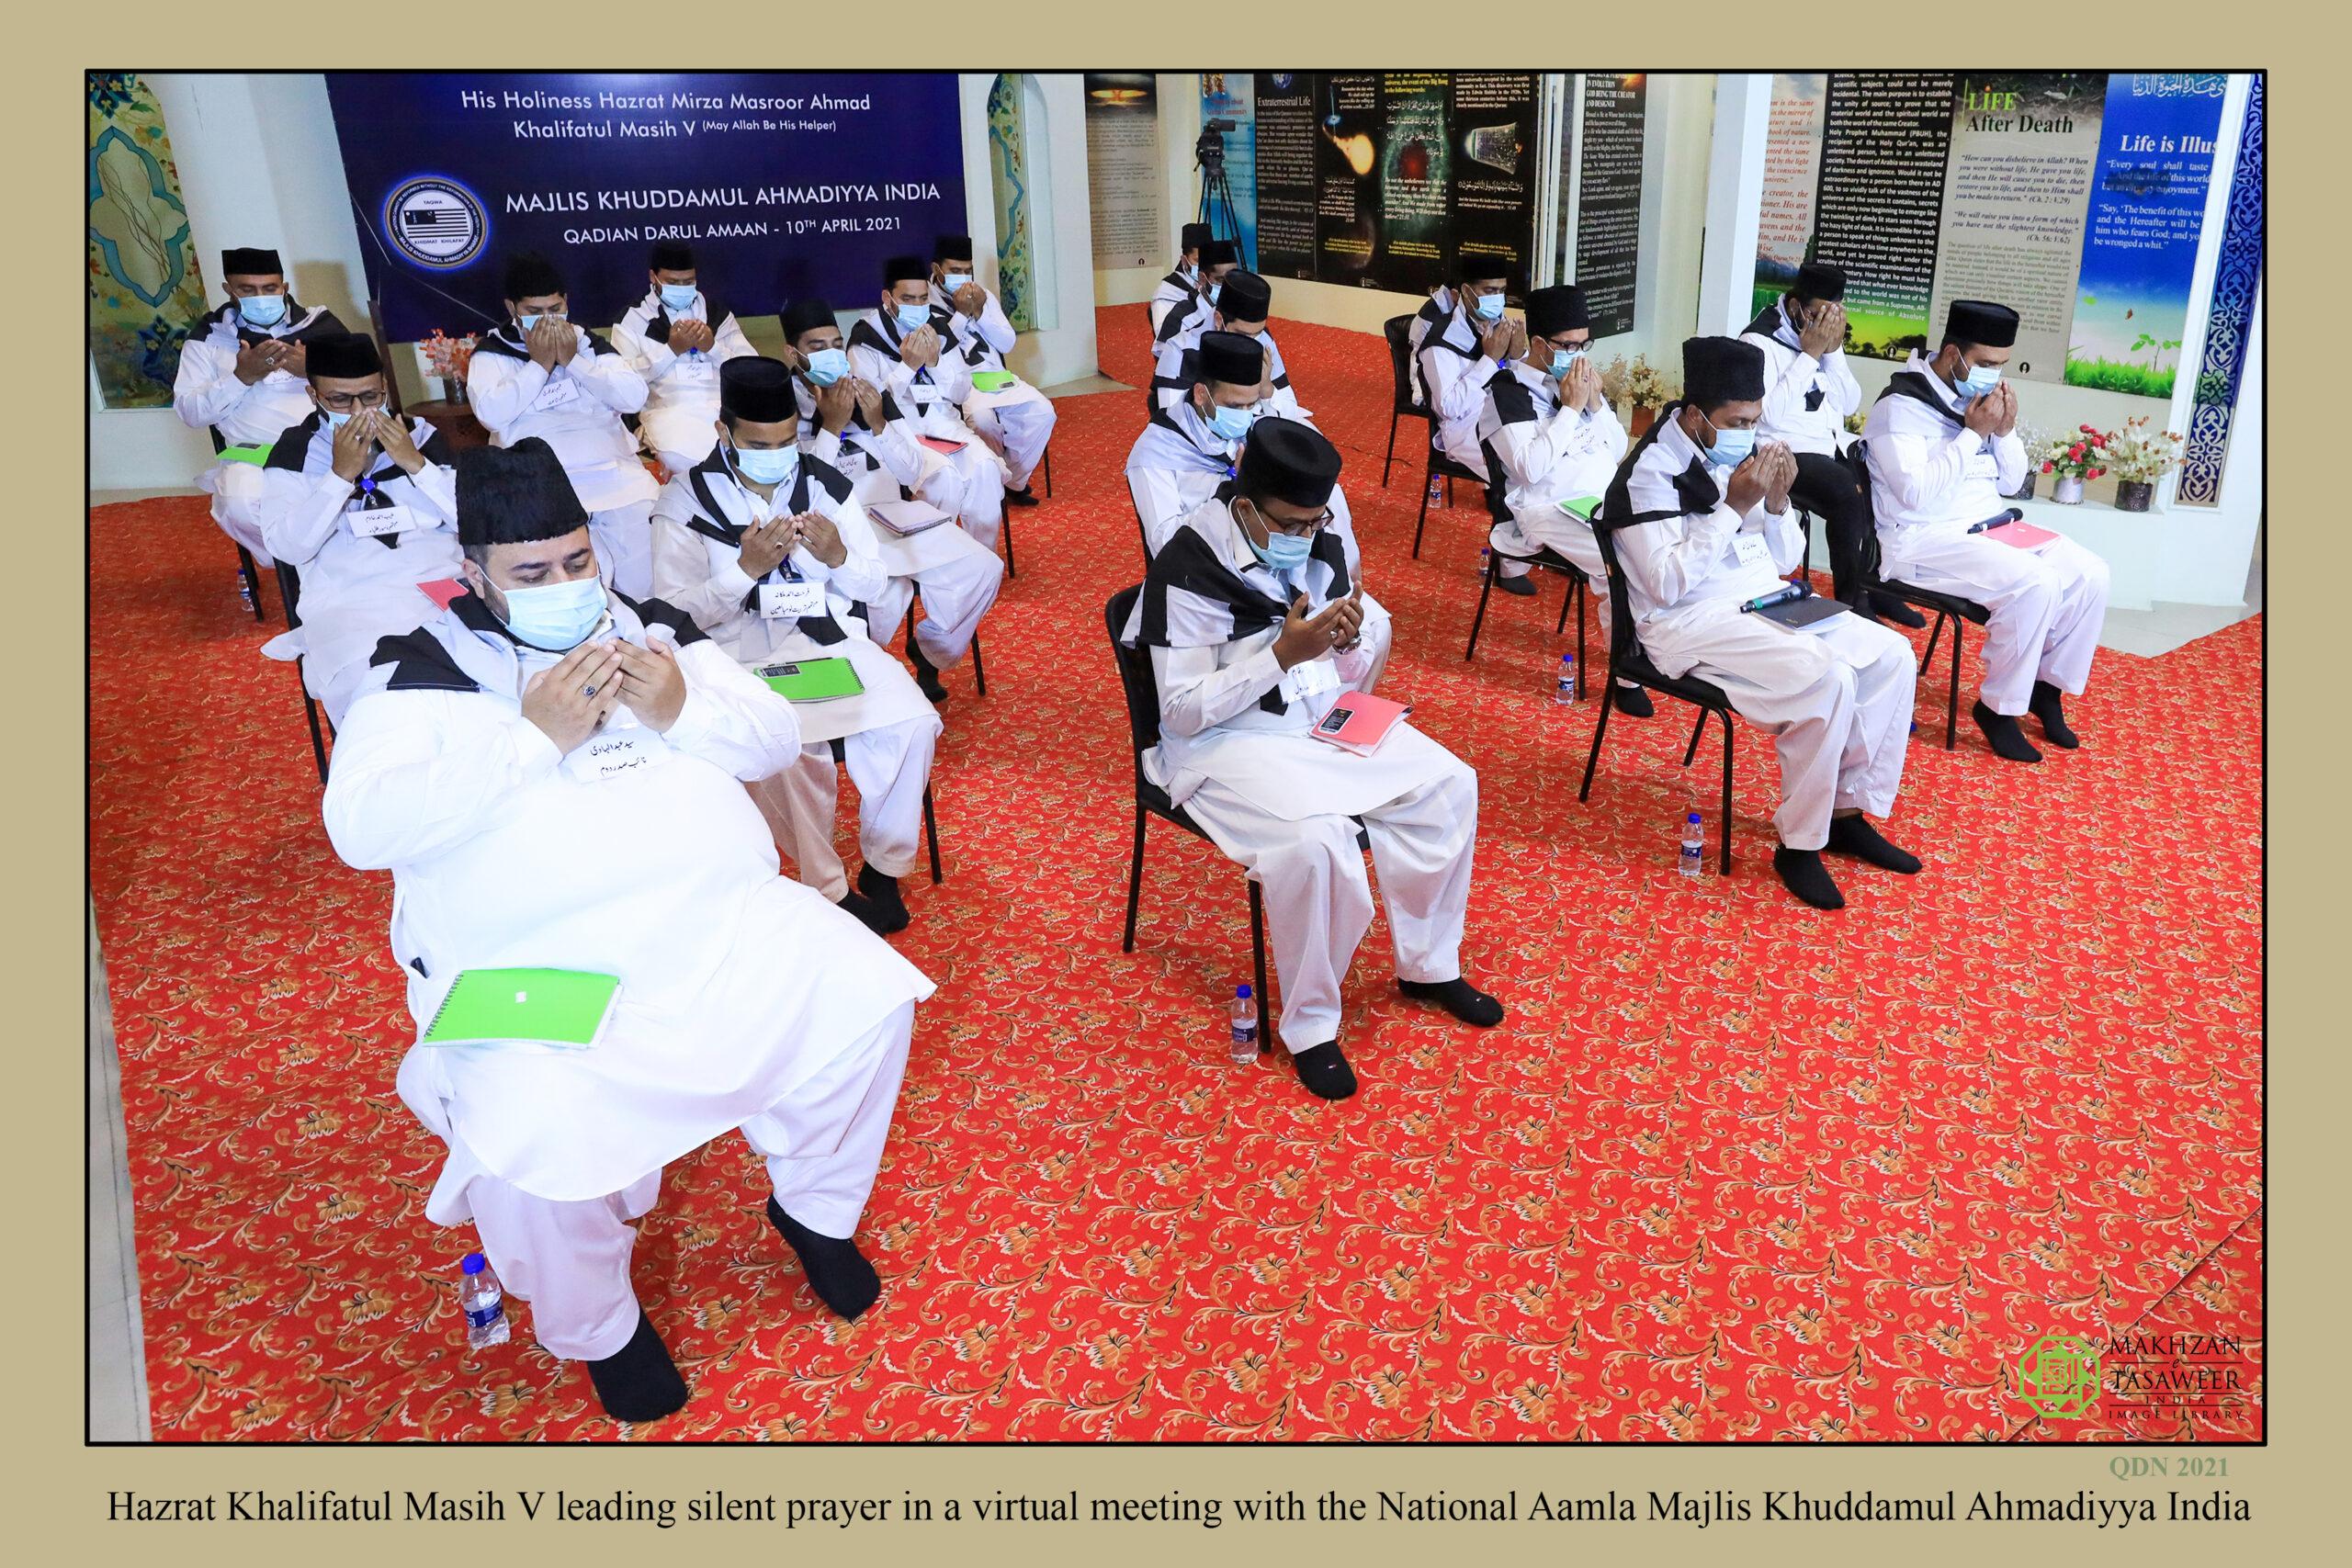 Hazrat Khalifatul Masih V grants a virtual meeting to the national Aamla Majlis Khuddamul Ahmadiyya India 003